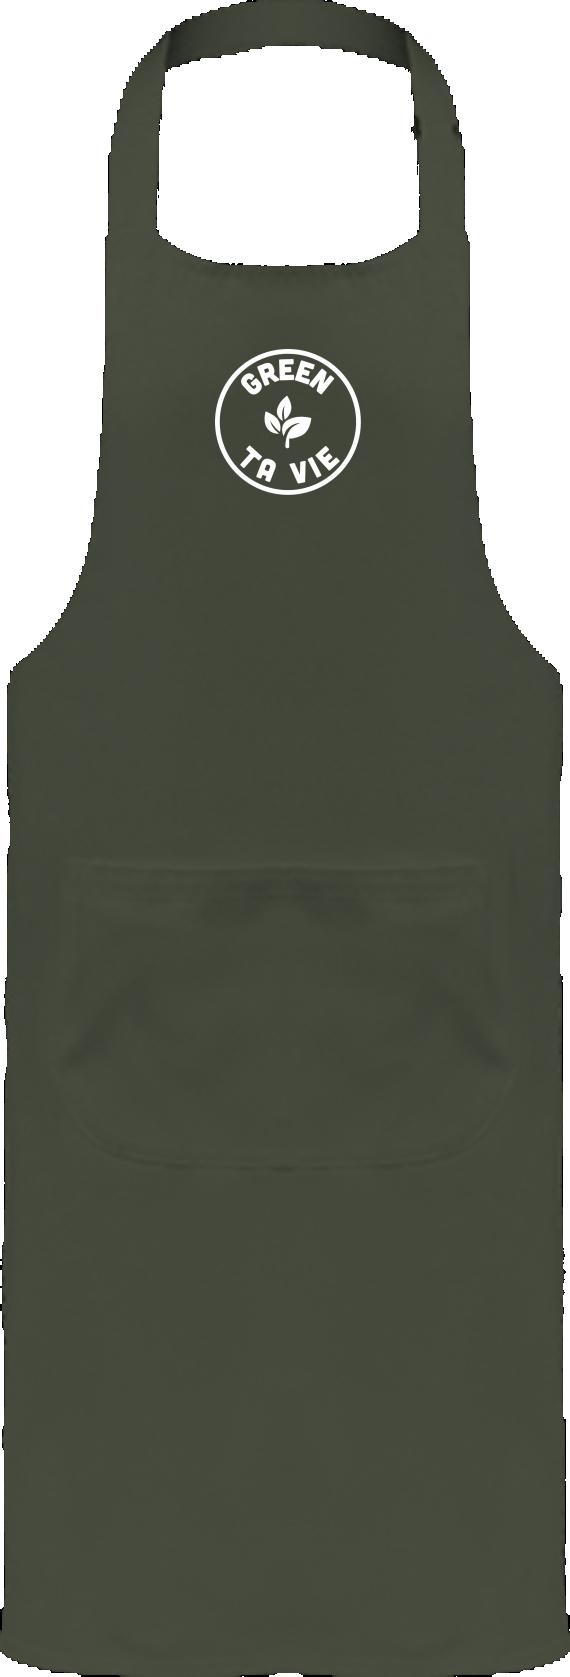 green-olive_plexus